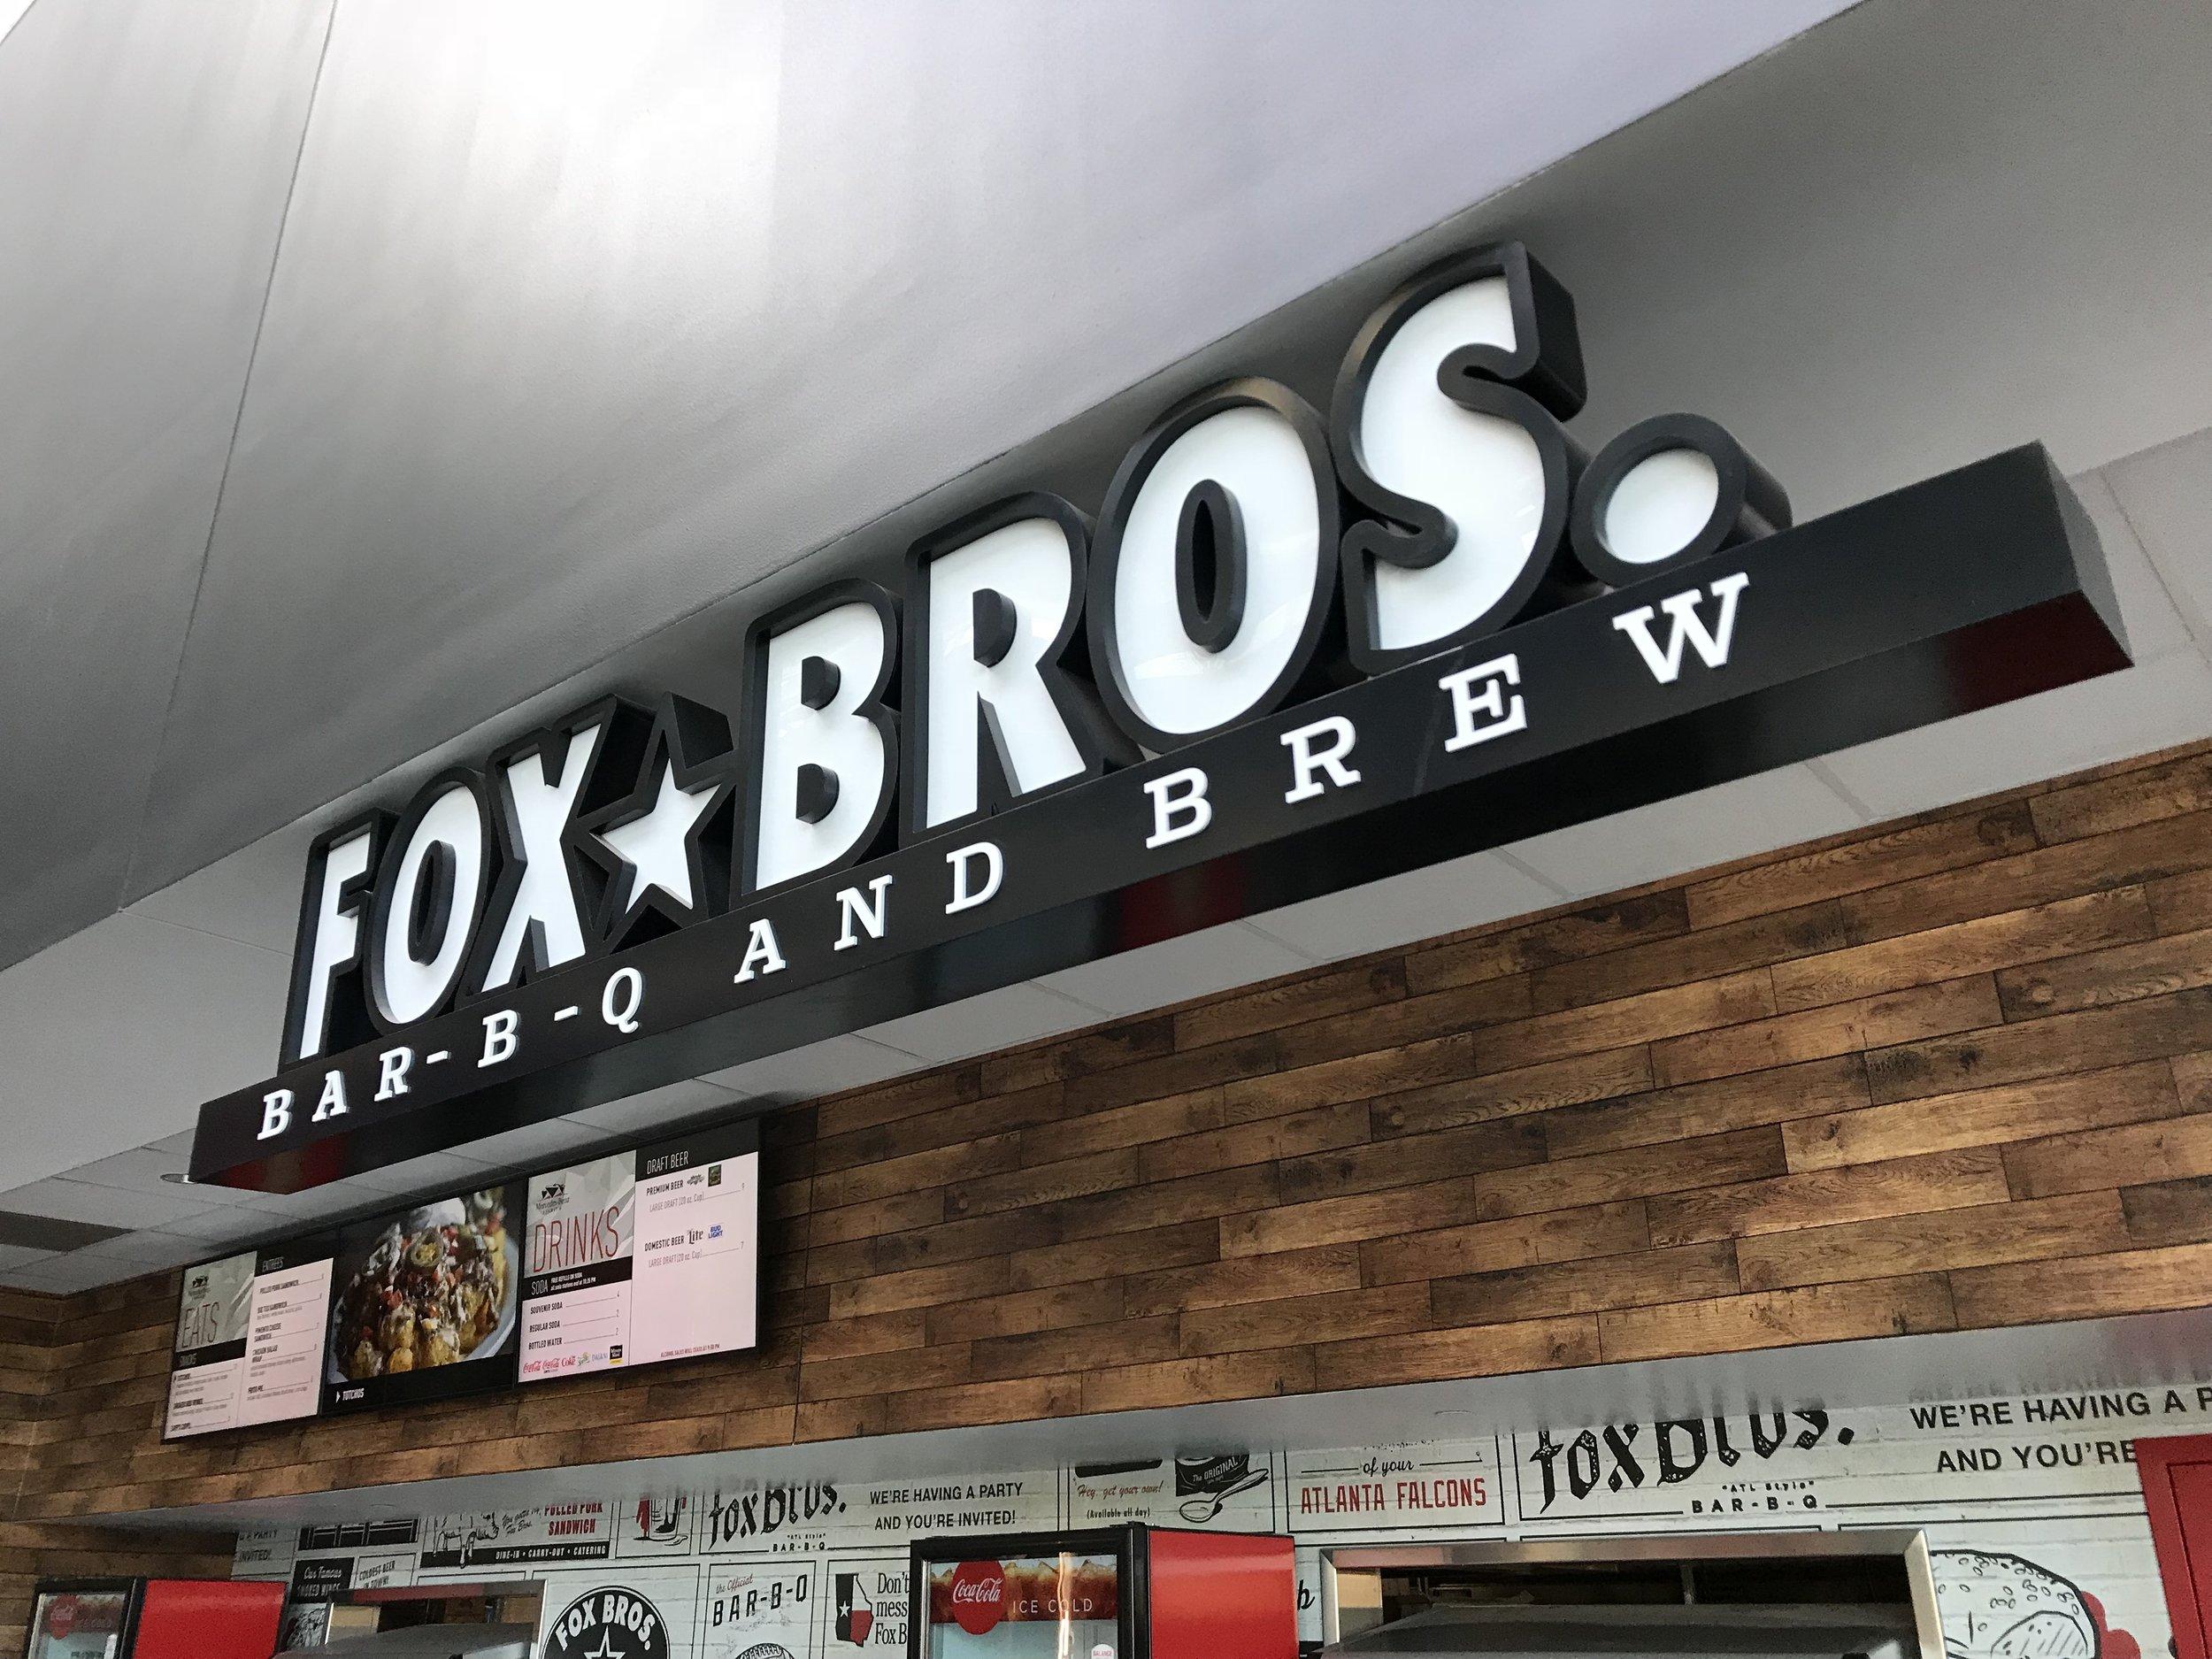 FoxBrosCrop.jpg